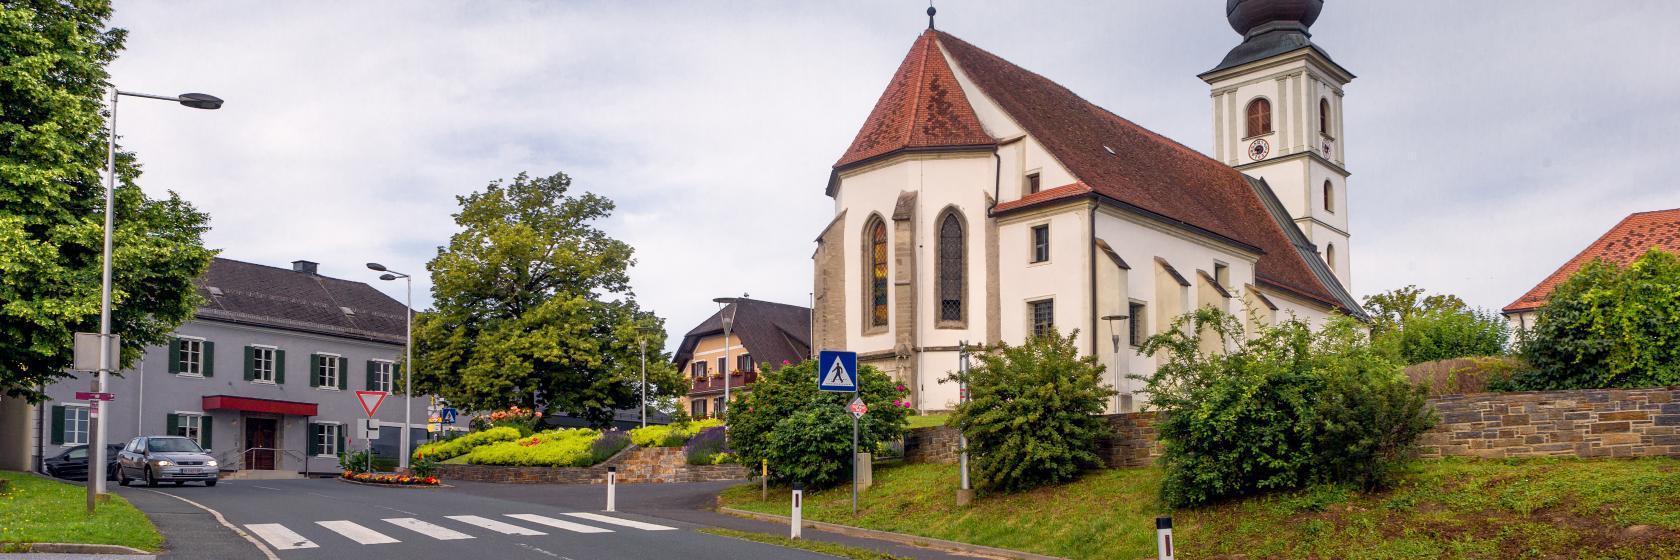 SingleWandern fr 40-59 jhrige Singles - Deutschlandsberg